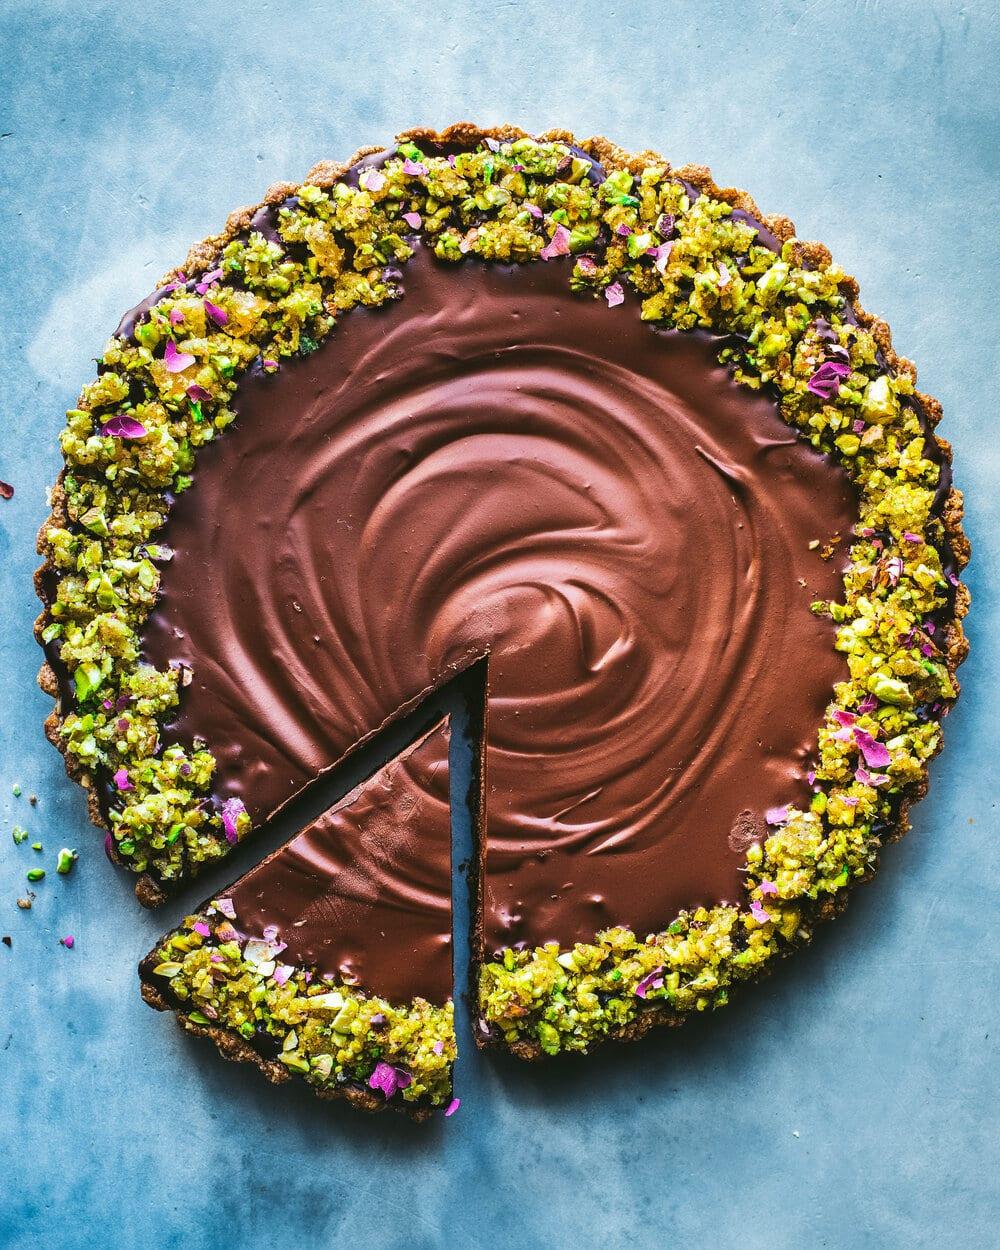 10 Vegan Chocolate Desserts for Valentine's Day